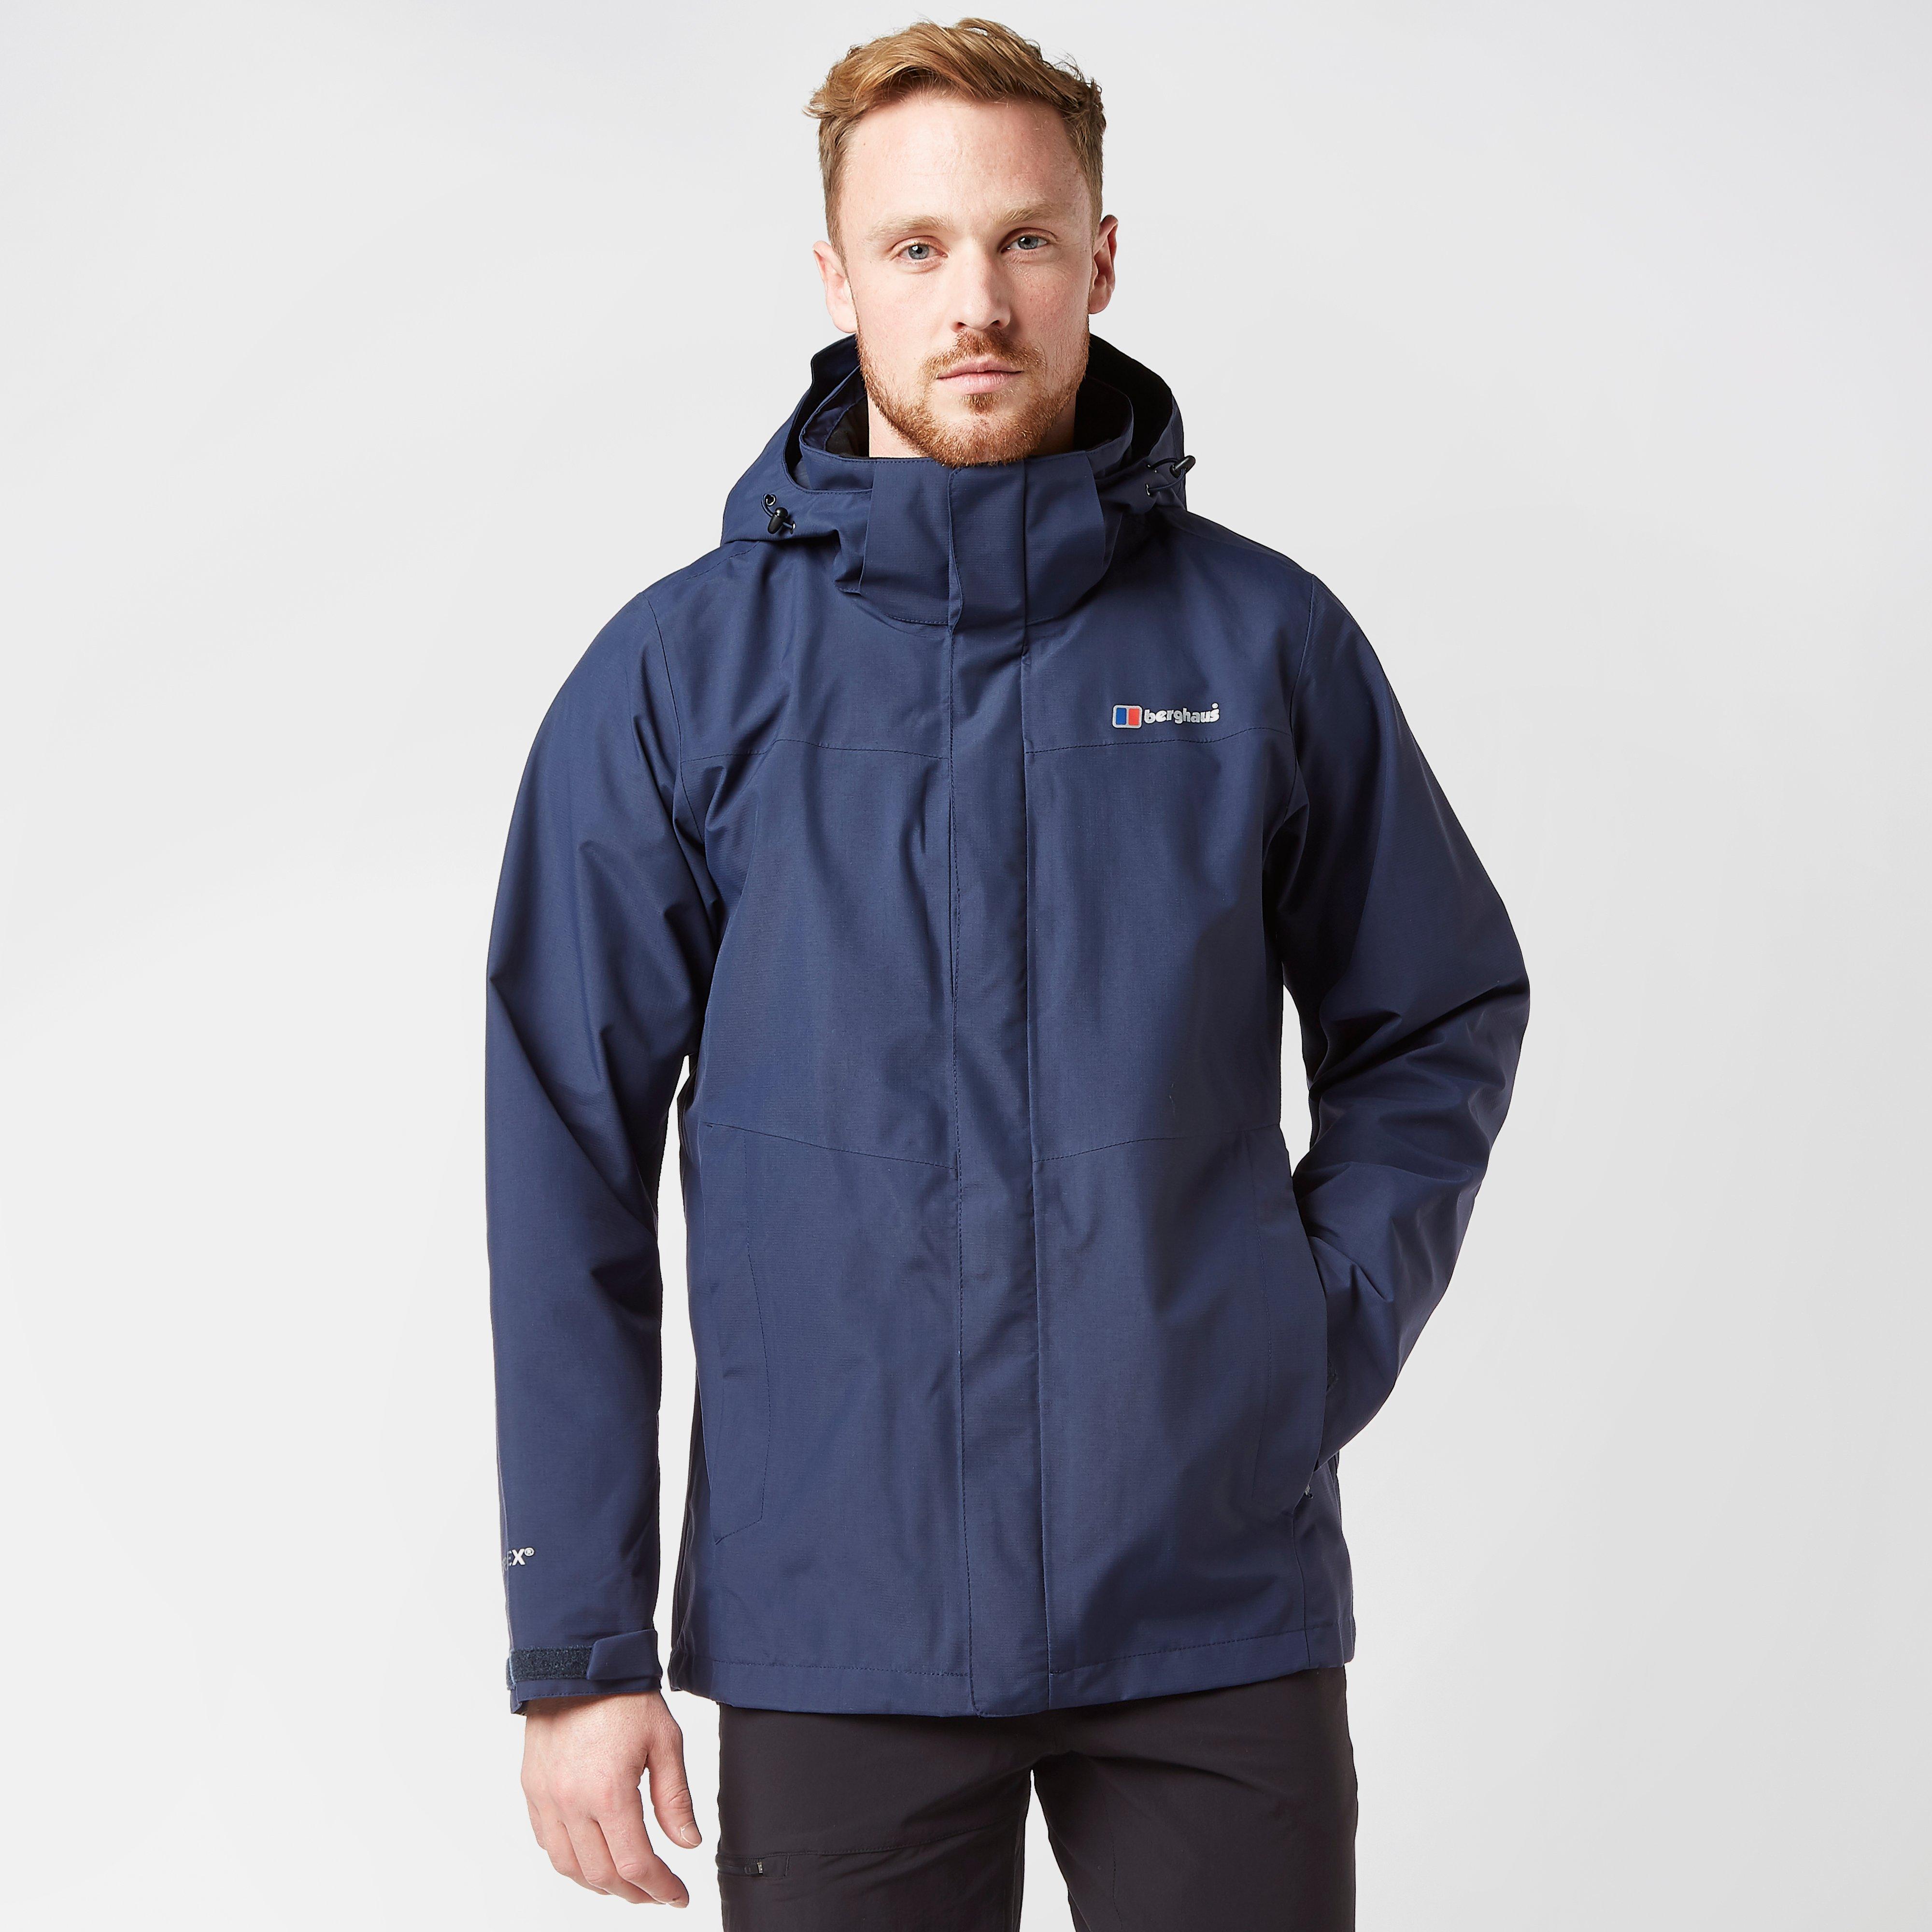 Berghaus Mens Maitland Gore-tex  Jacket - Blue/blue  Blue/blue